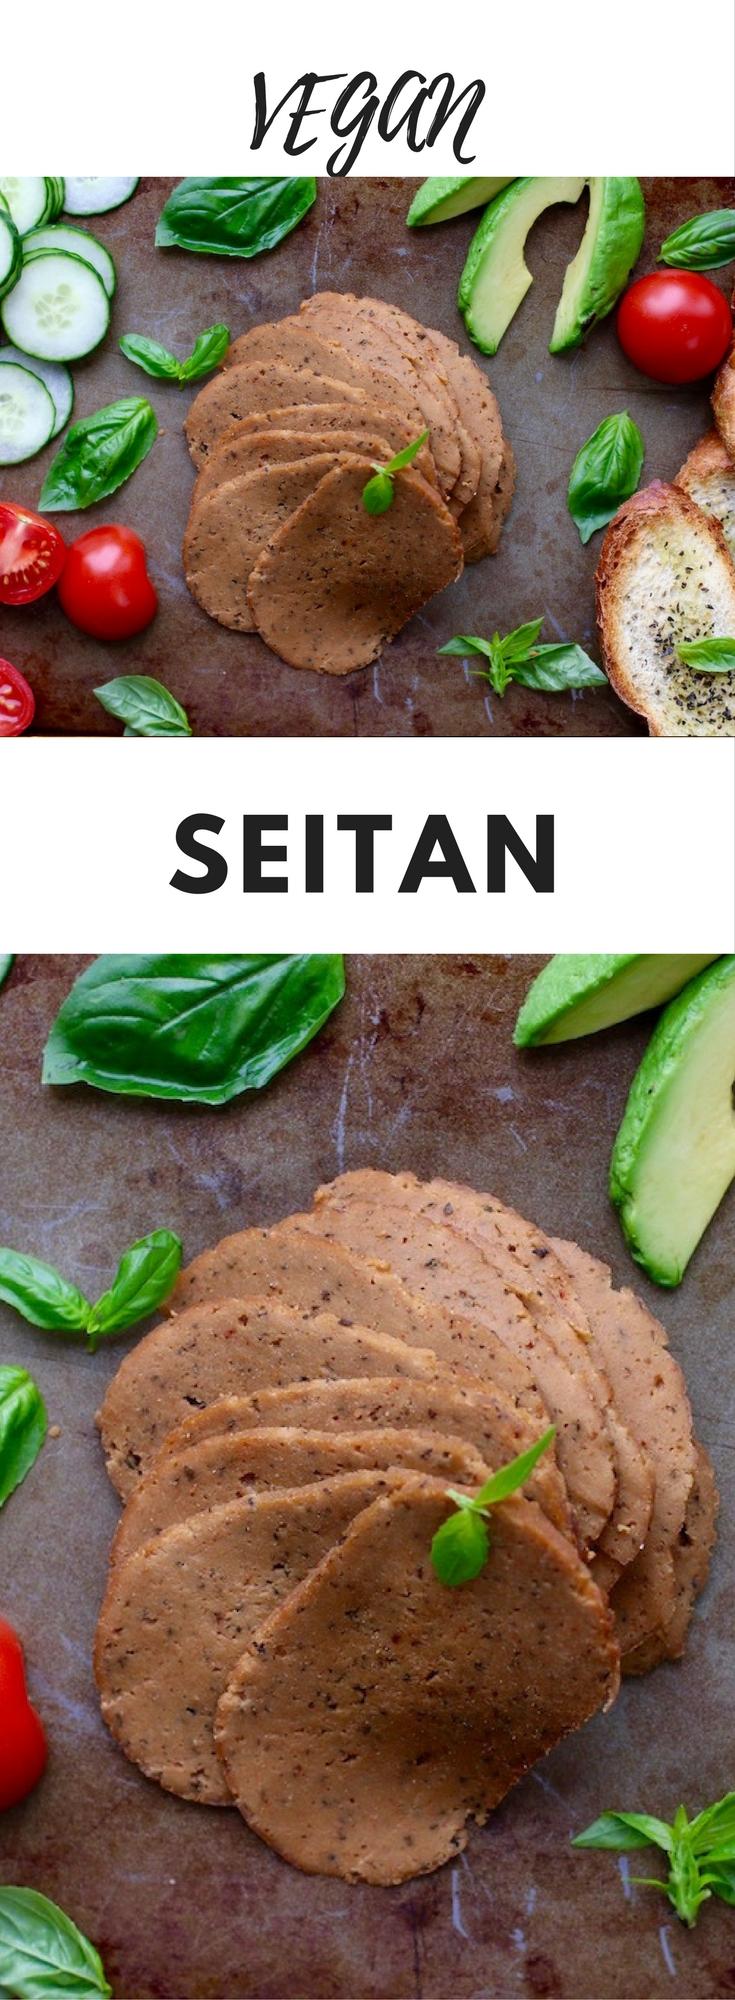 recipe: how to make seitan [37]